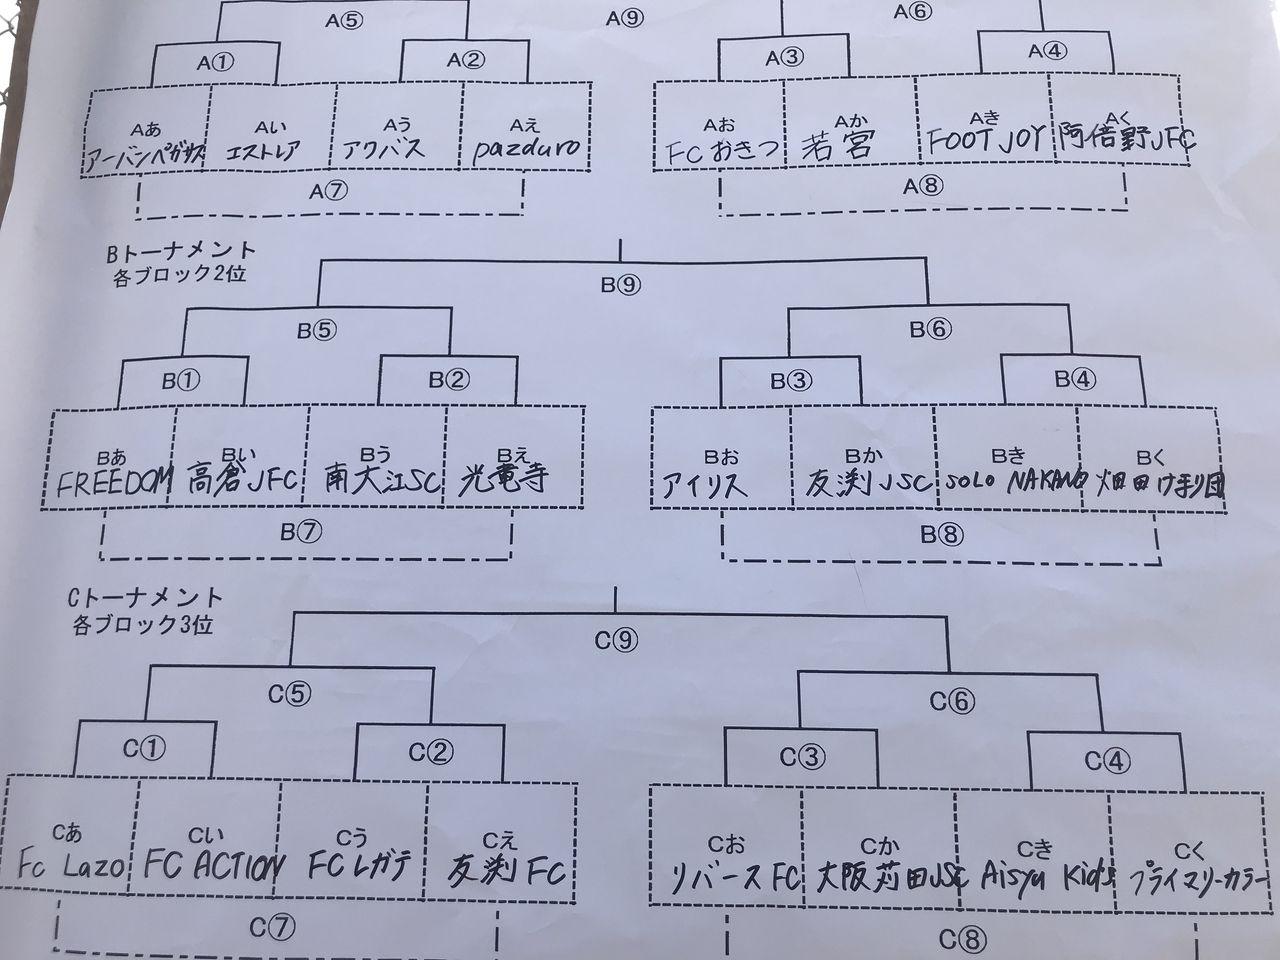 511AFDB8-6D22-43B7-AE5D-68711551218D